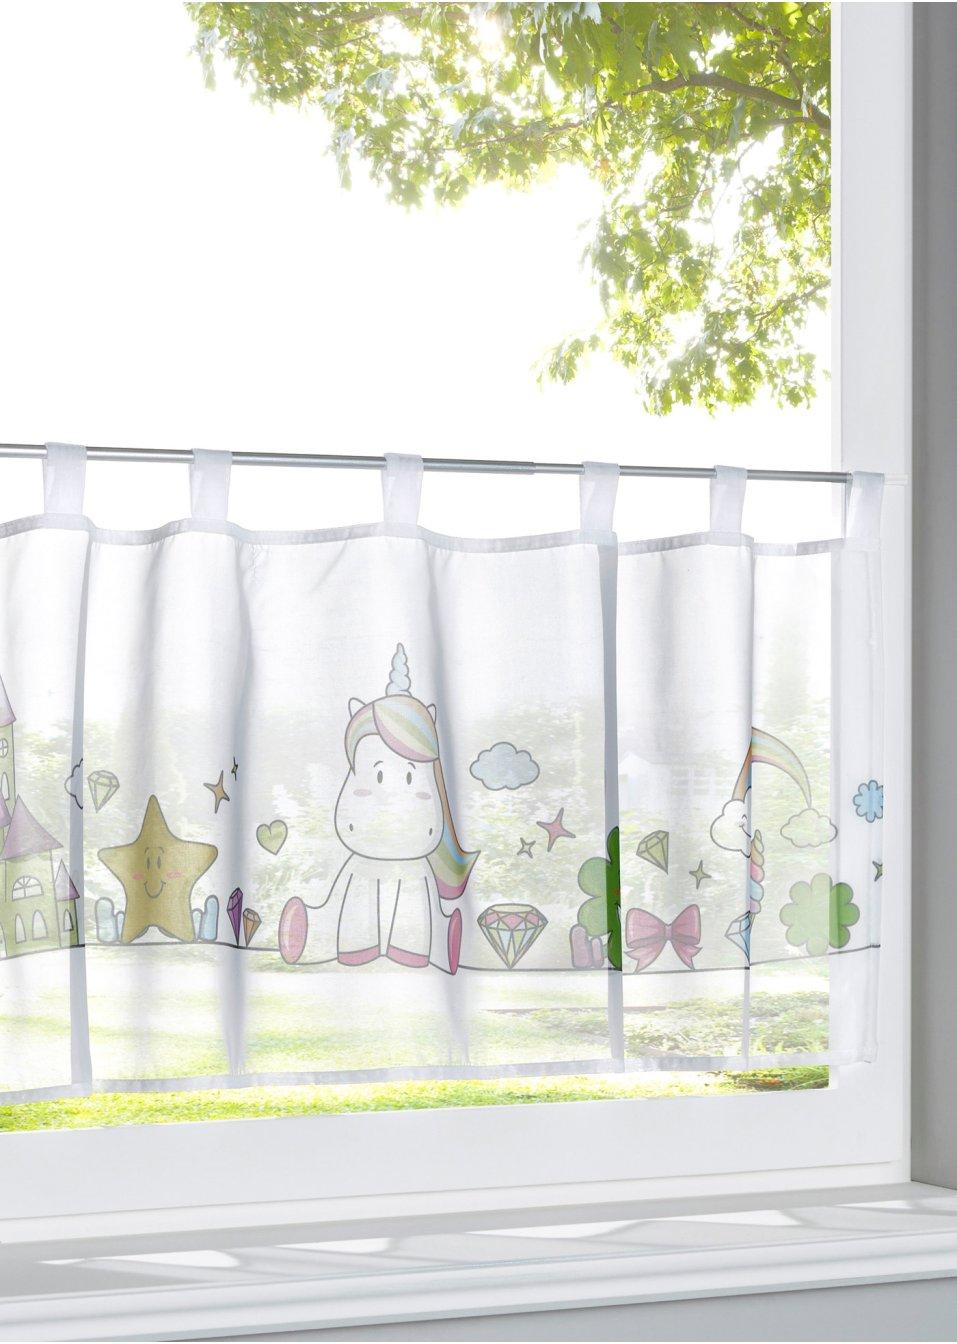 Full Size of Scheibengardine Kinderzimmer Tiere Lila Bonprix Elefant Eule Sterne Meterware Ikea Schmetterling Regal Weiß Scheibengardinen Küche Regale Sofa Kinderzimmer Scheibengardine Kinderzimmer